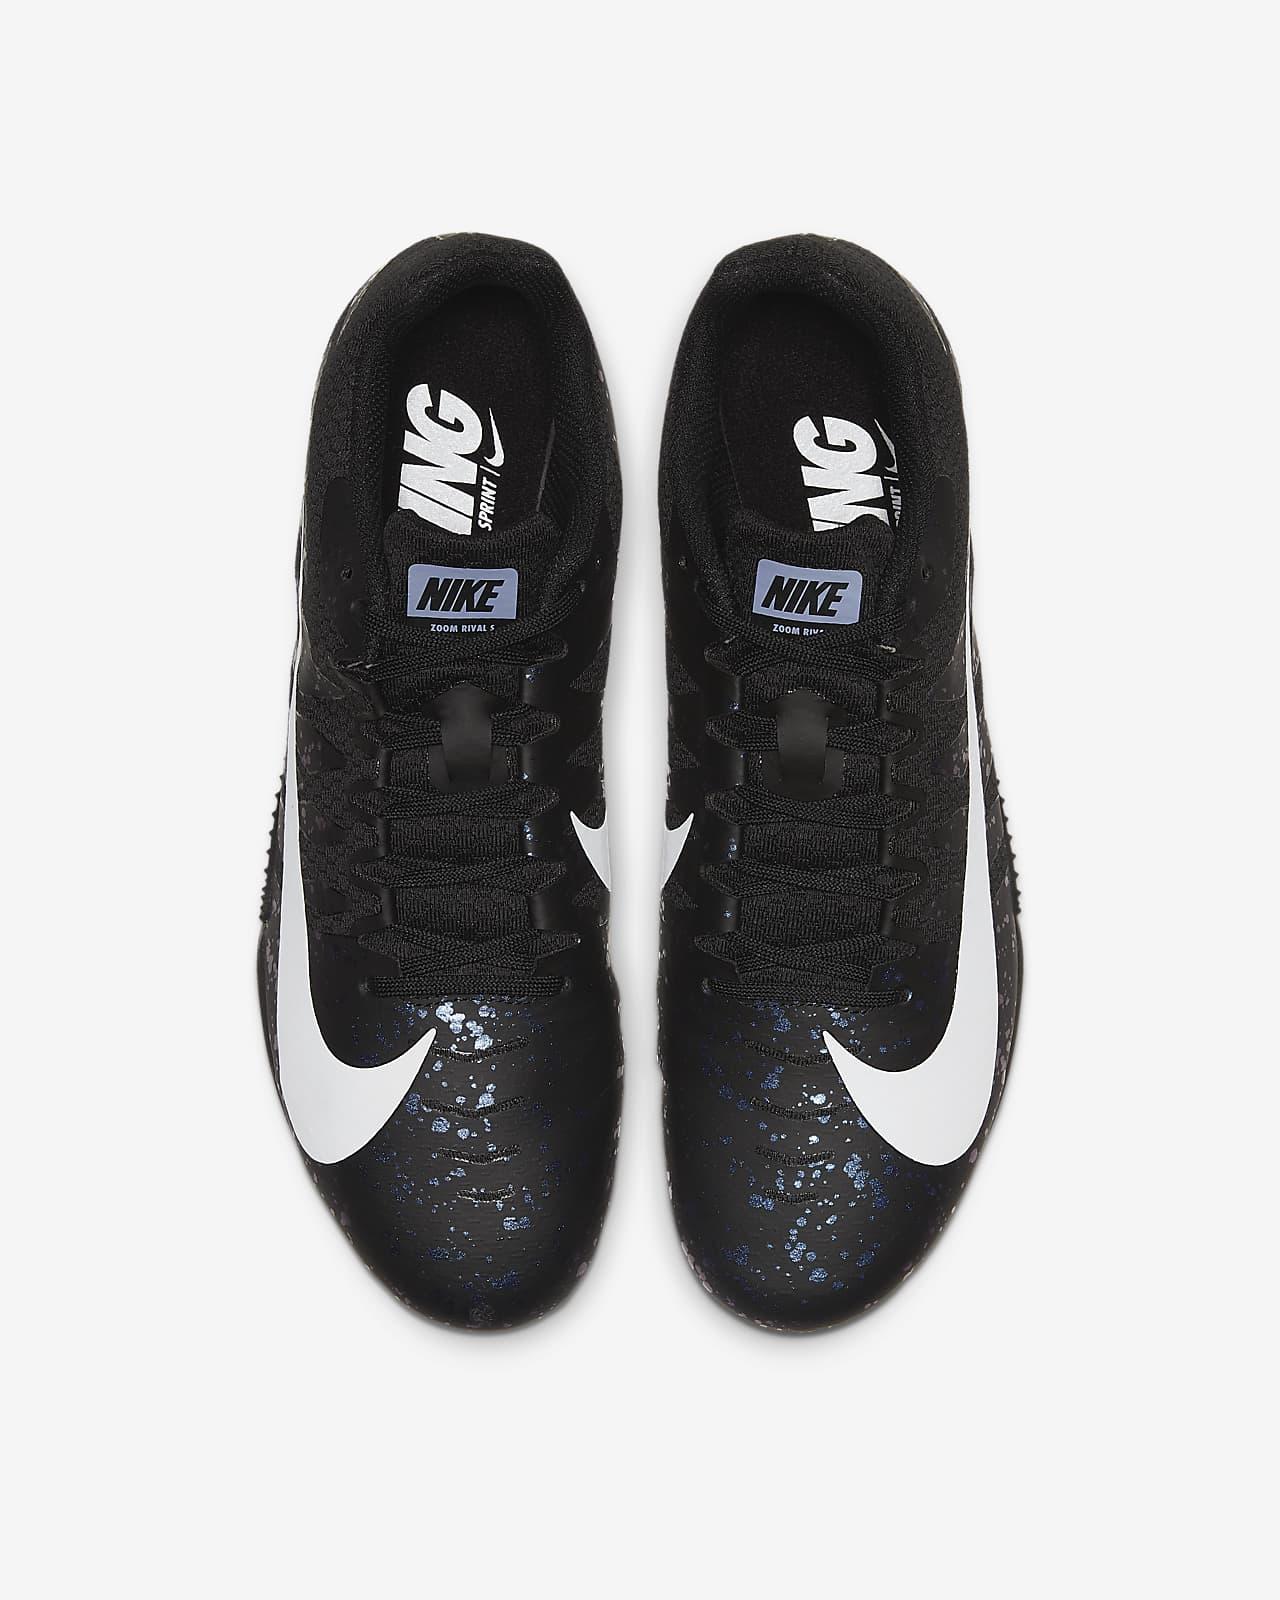 Nike Zoom Rival S 9 Racing Spike. Nike LU